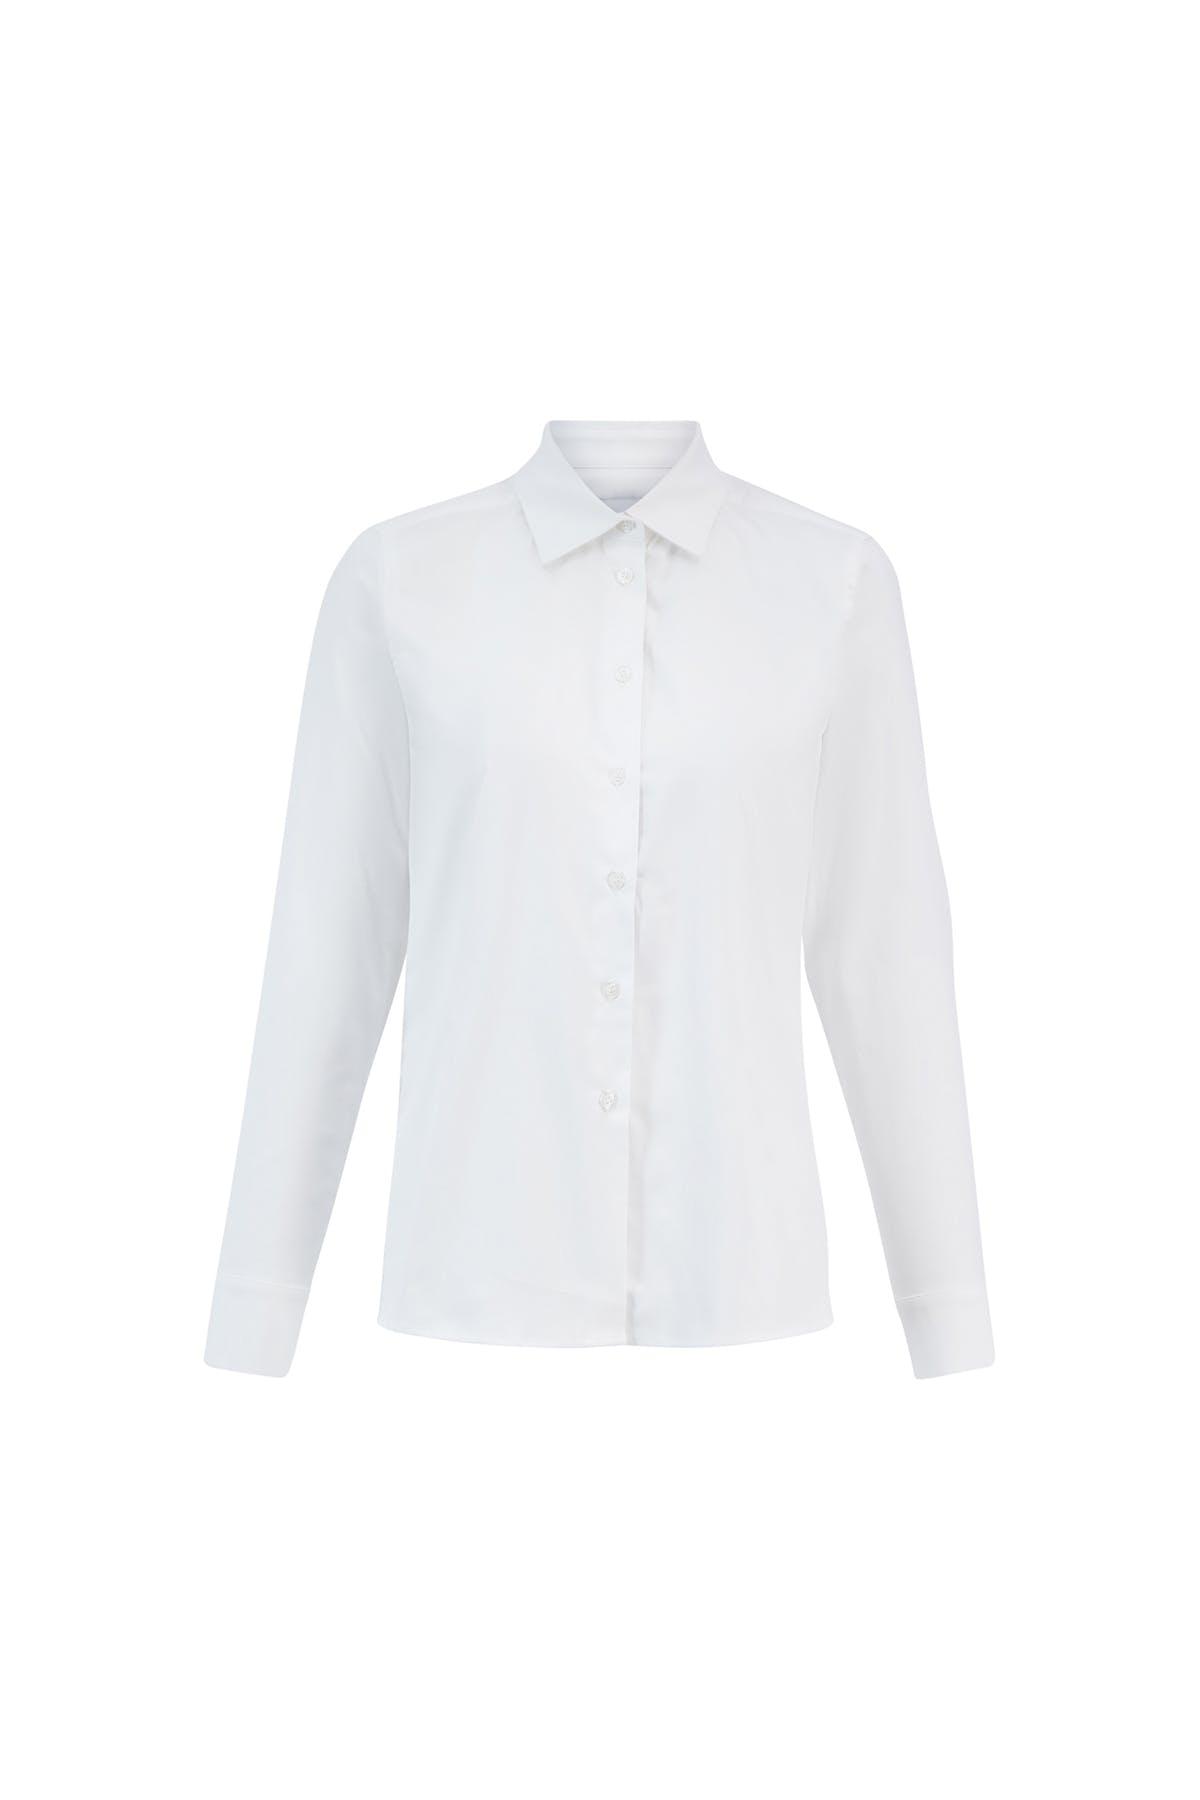 misha-nanoo-meghan-markle-shirt.jpg